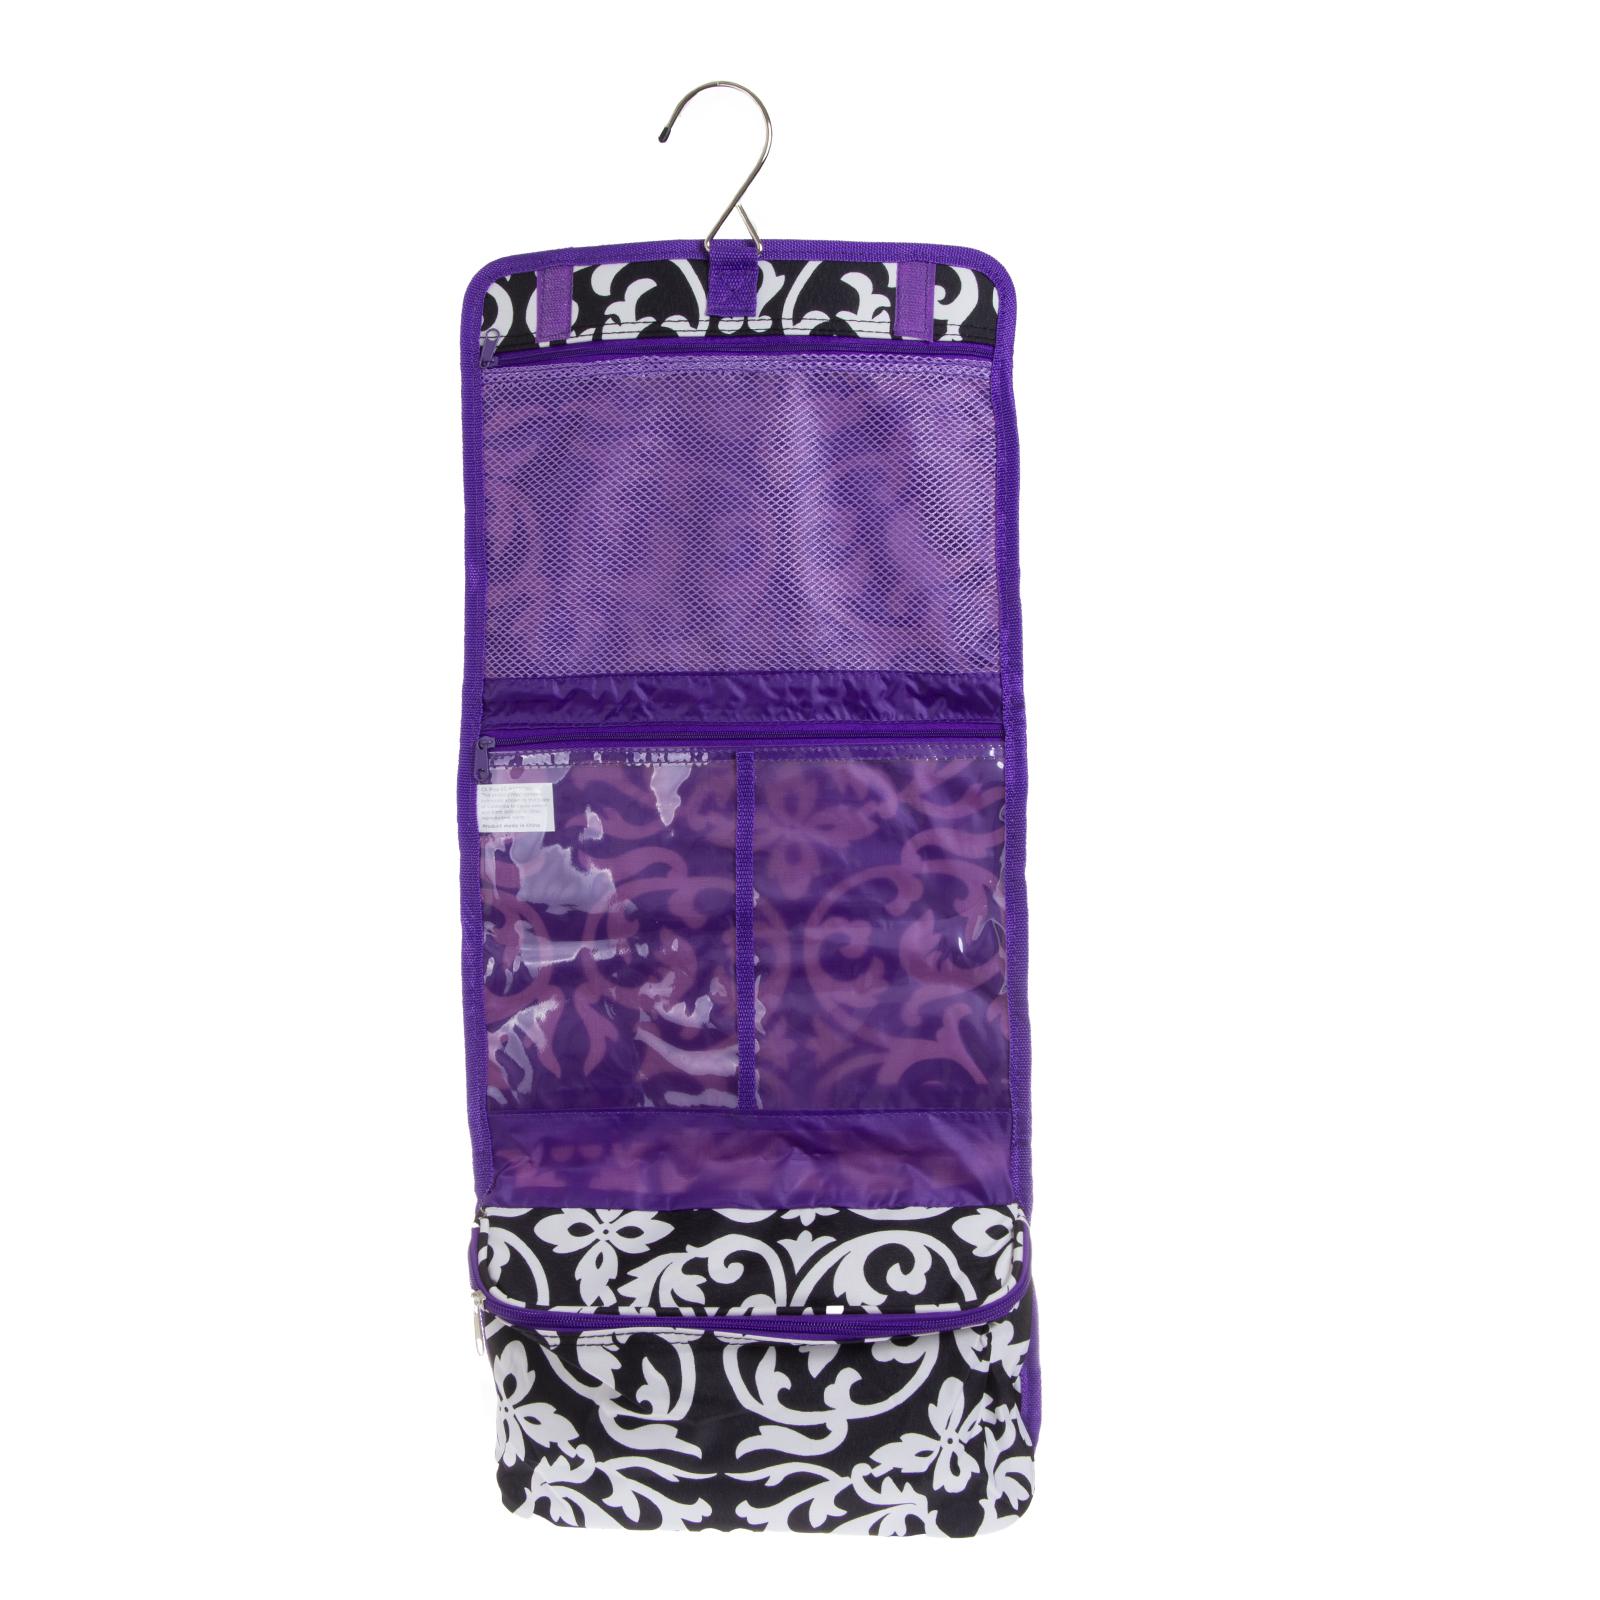 Popular Kathmandu Mens Womens Kit Classic Hanging Travel Organiser Toiletry Bag Black | EBay